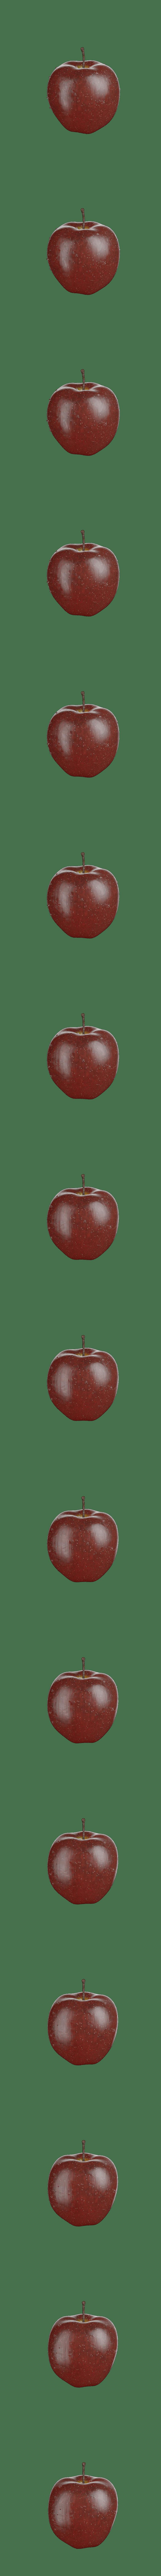 apple sprite